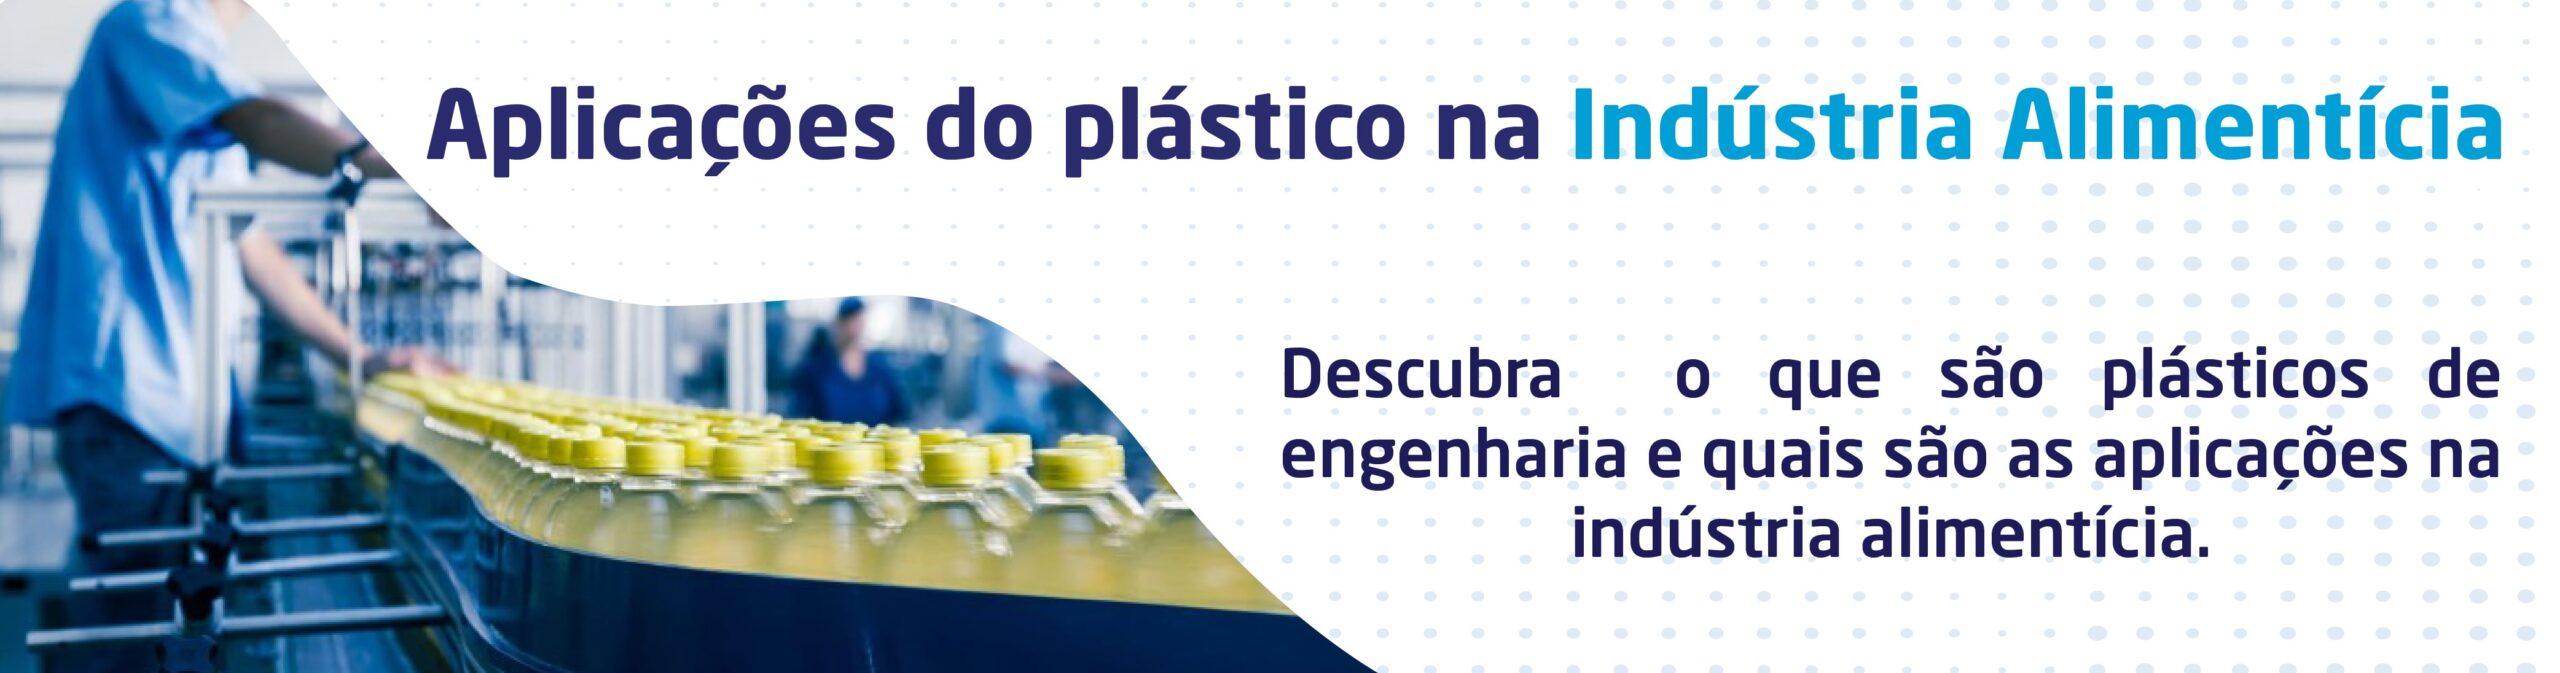 aplicacoes-plastico-industria-alimenticia